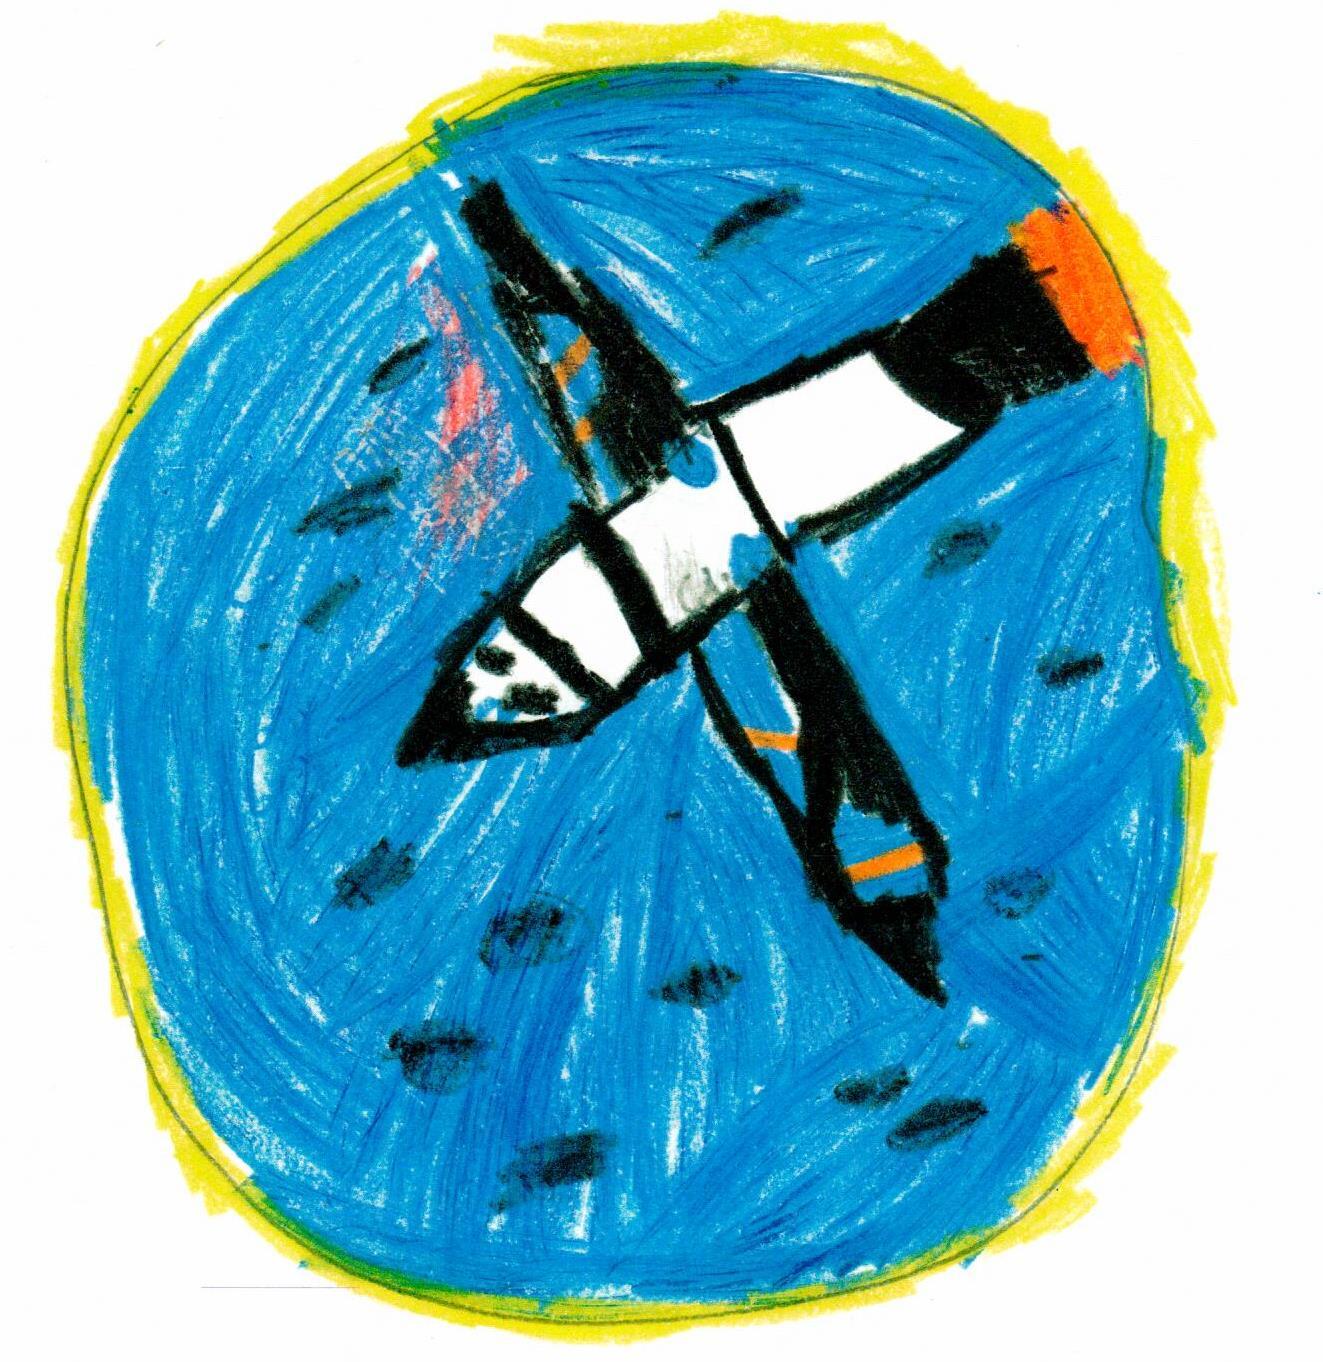 vg spaceship.jpg